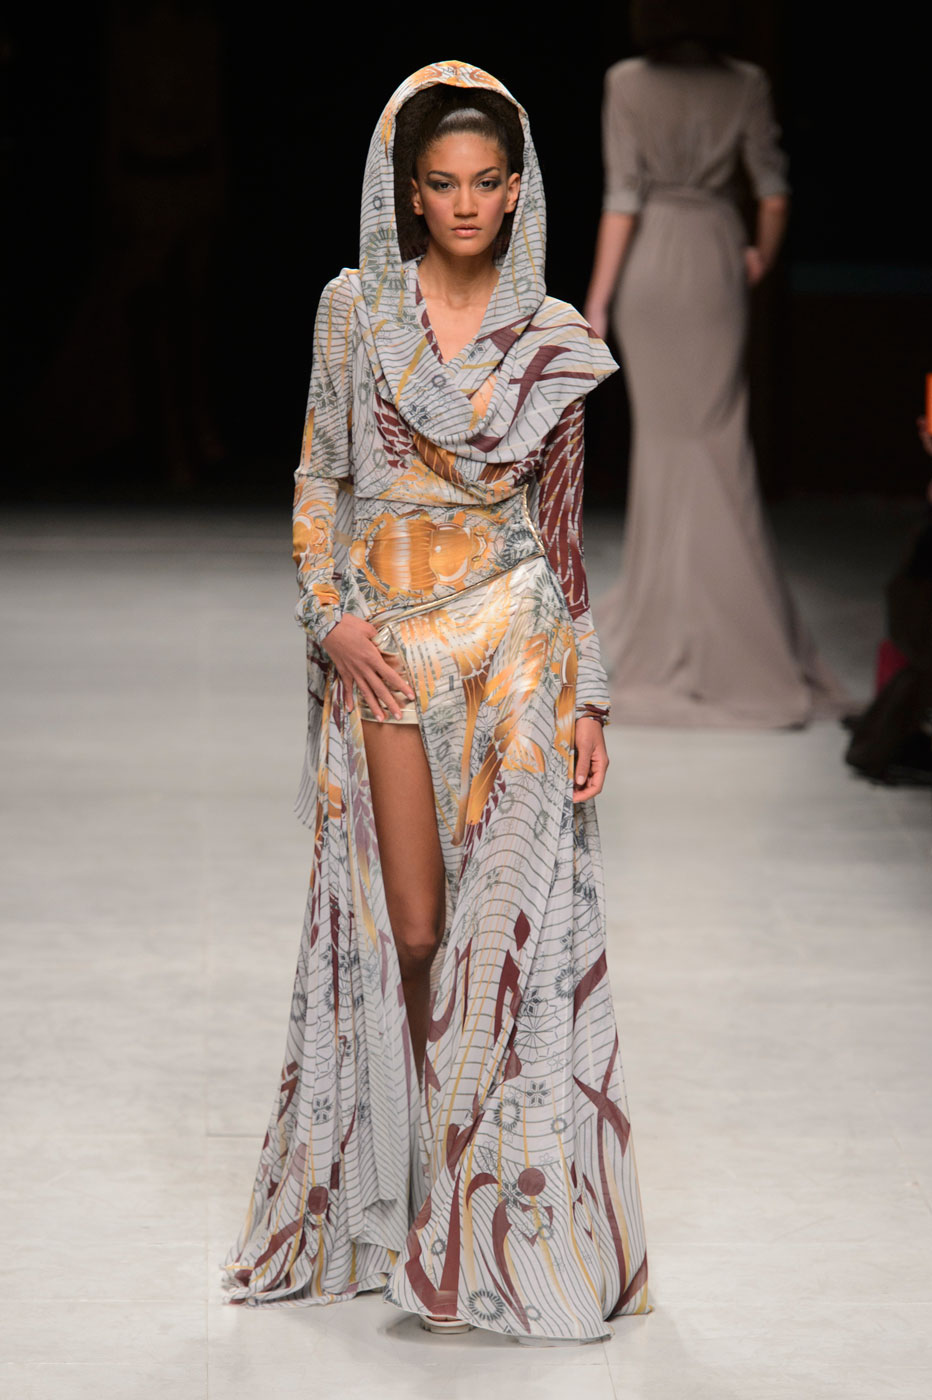 Julien-Fournie-Prive-fashion-runway-show-haute-couture-paris-spring-2015-the-impression-24